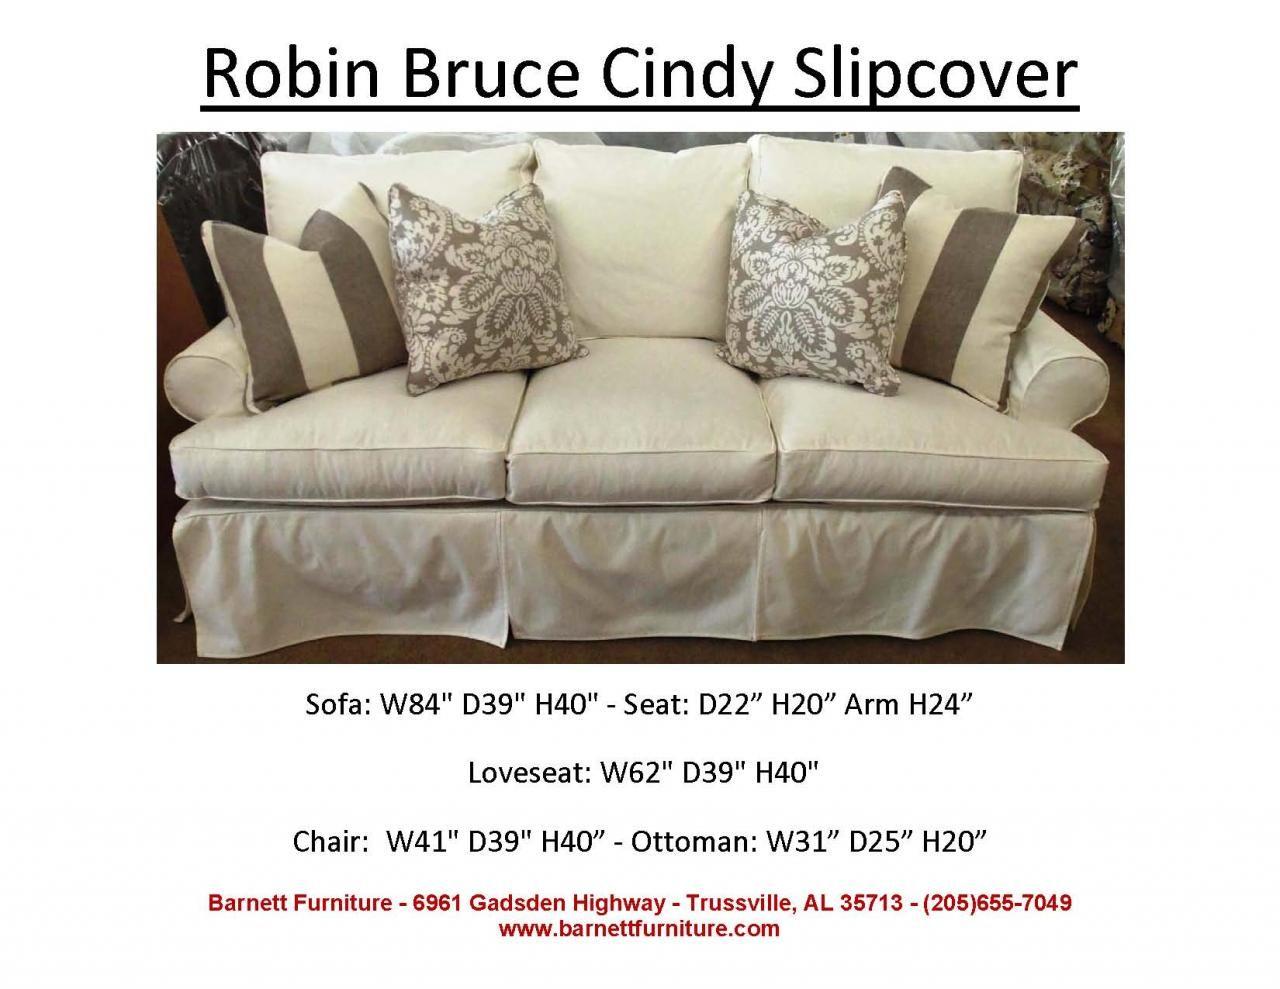 Robin Bruce Cindy Slipcover Sofa You Choose The Fabric